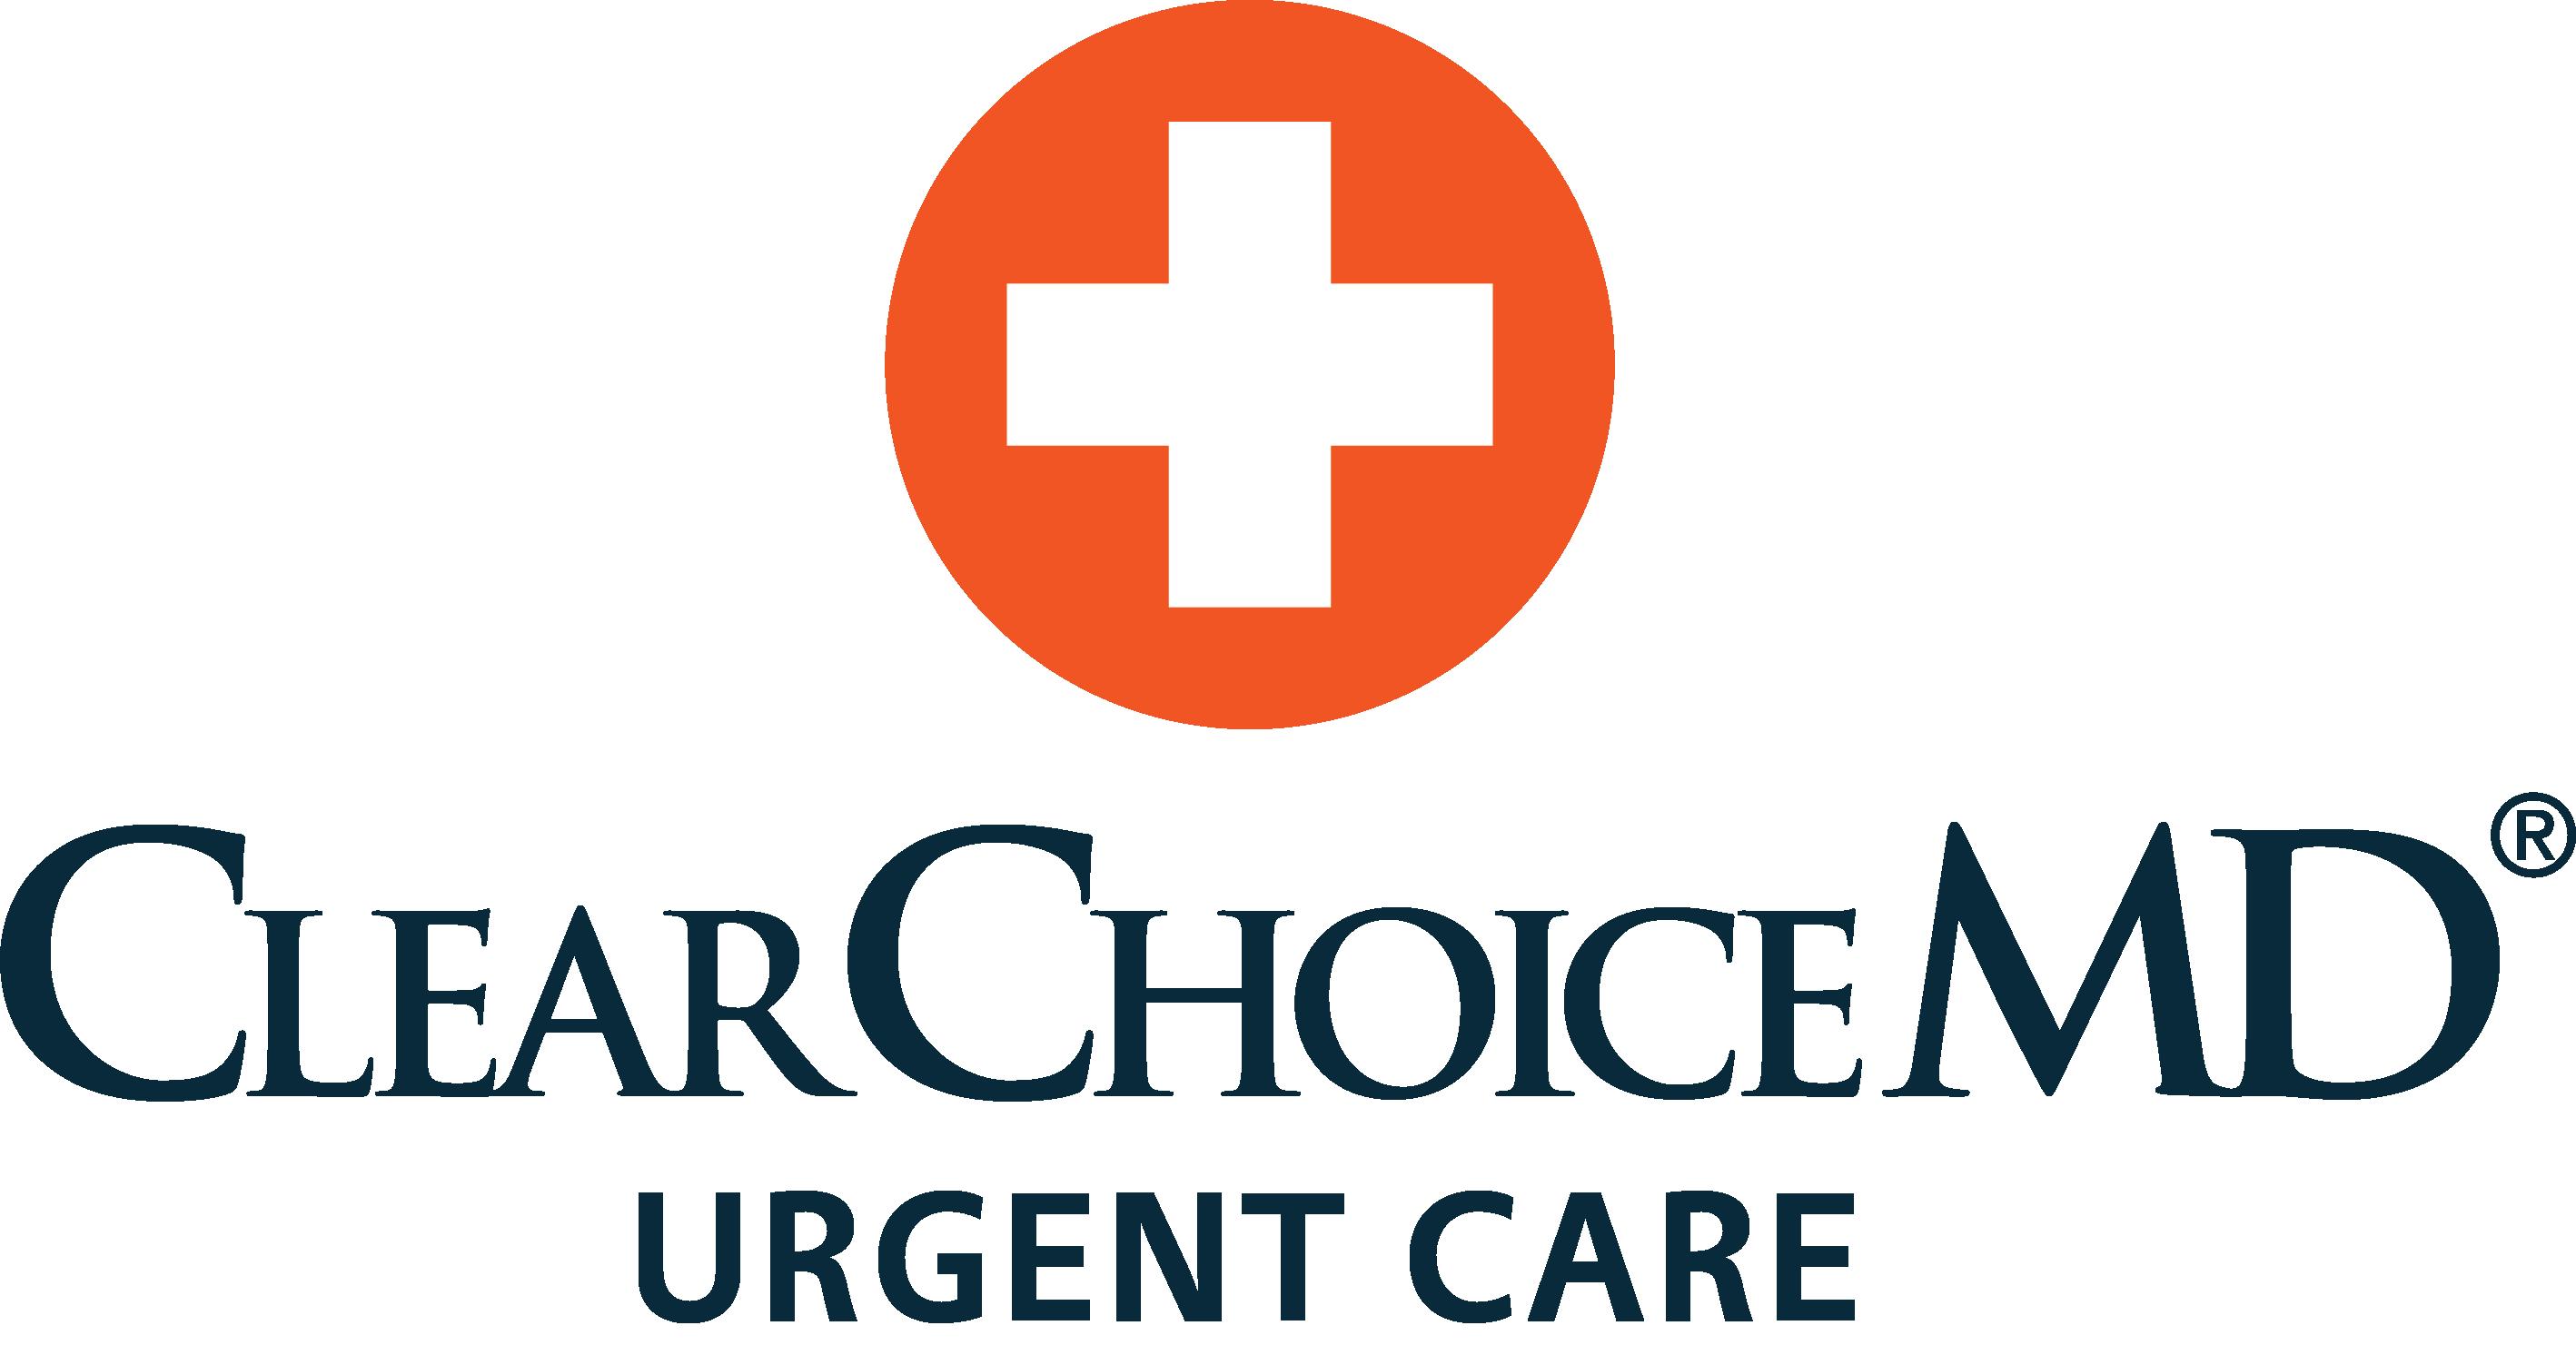 ClearChoiceMD Urgent Care - Berlin, VT Logo